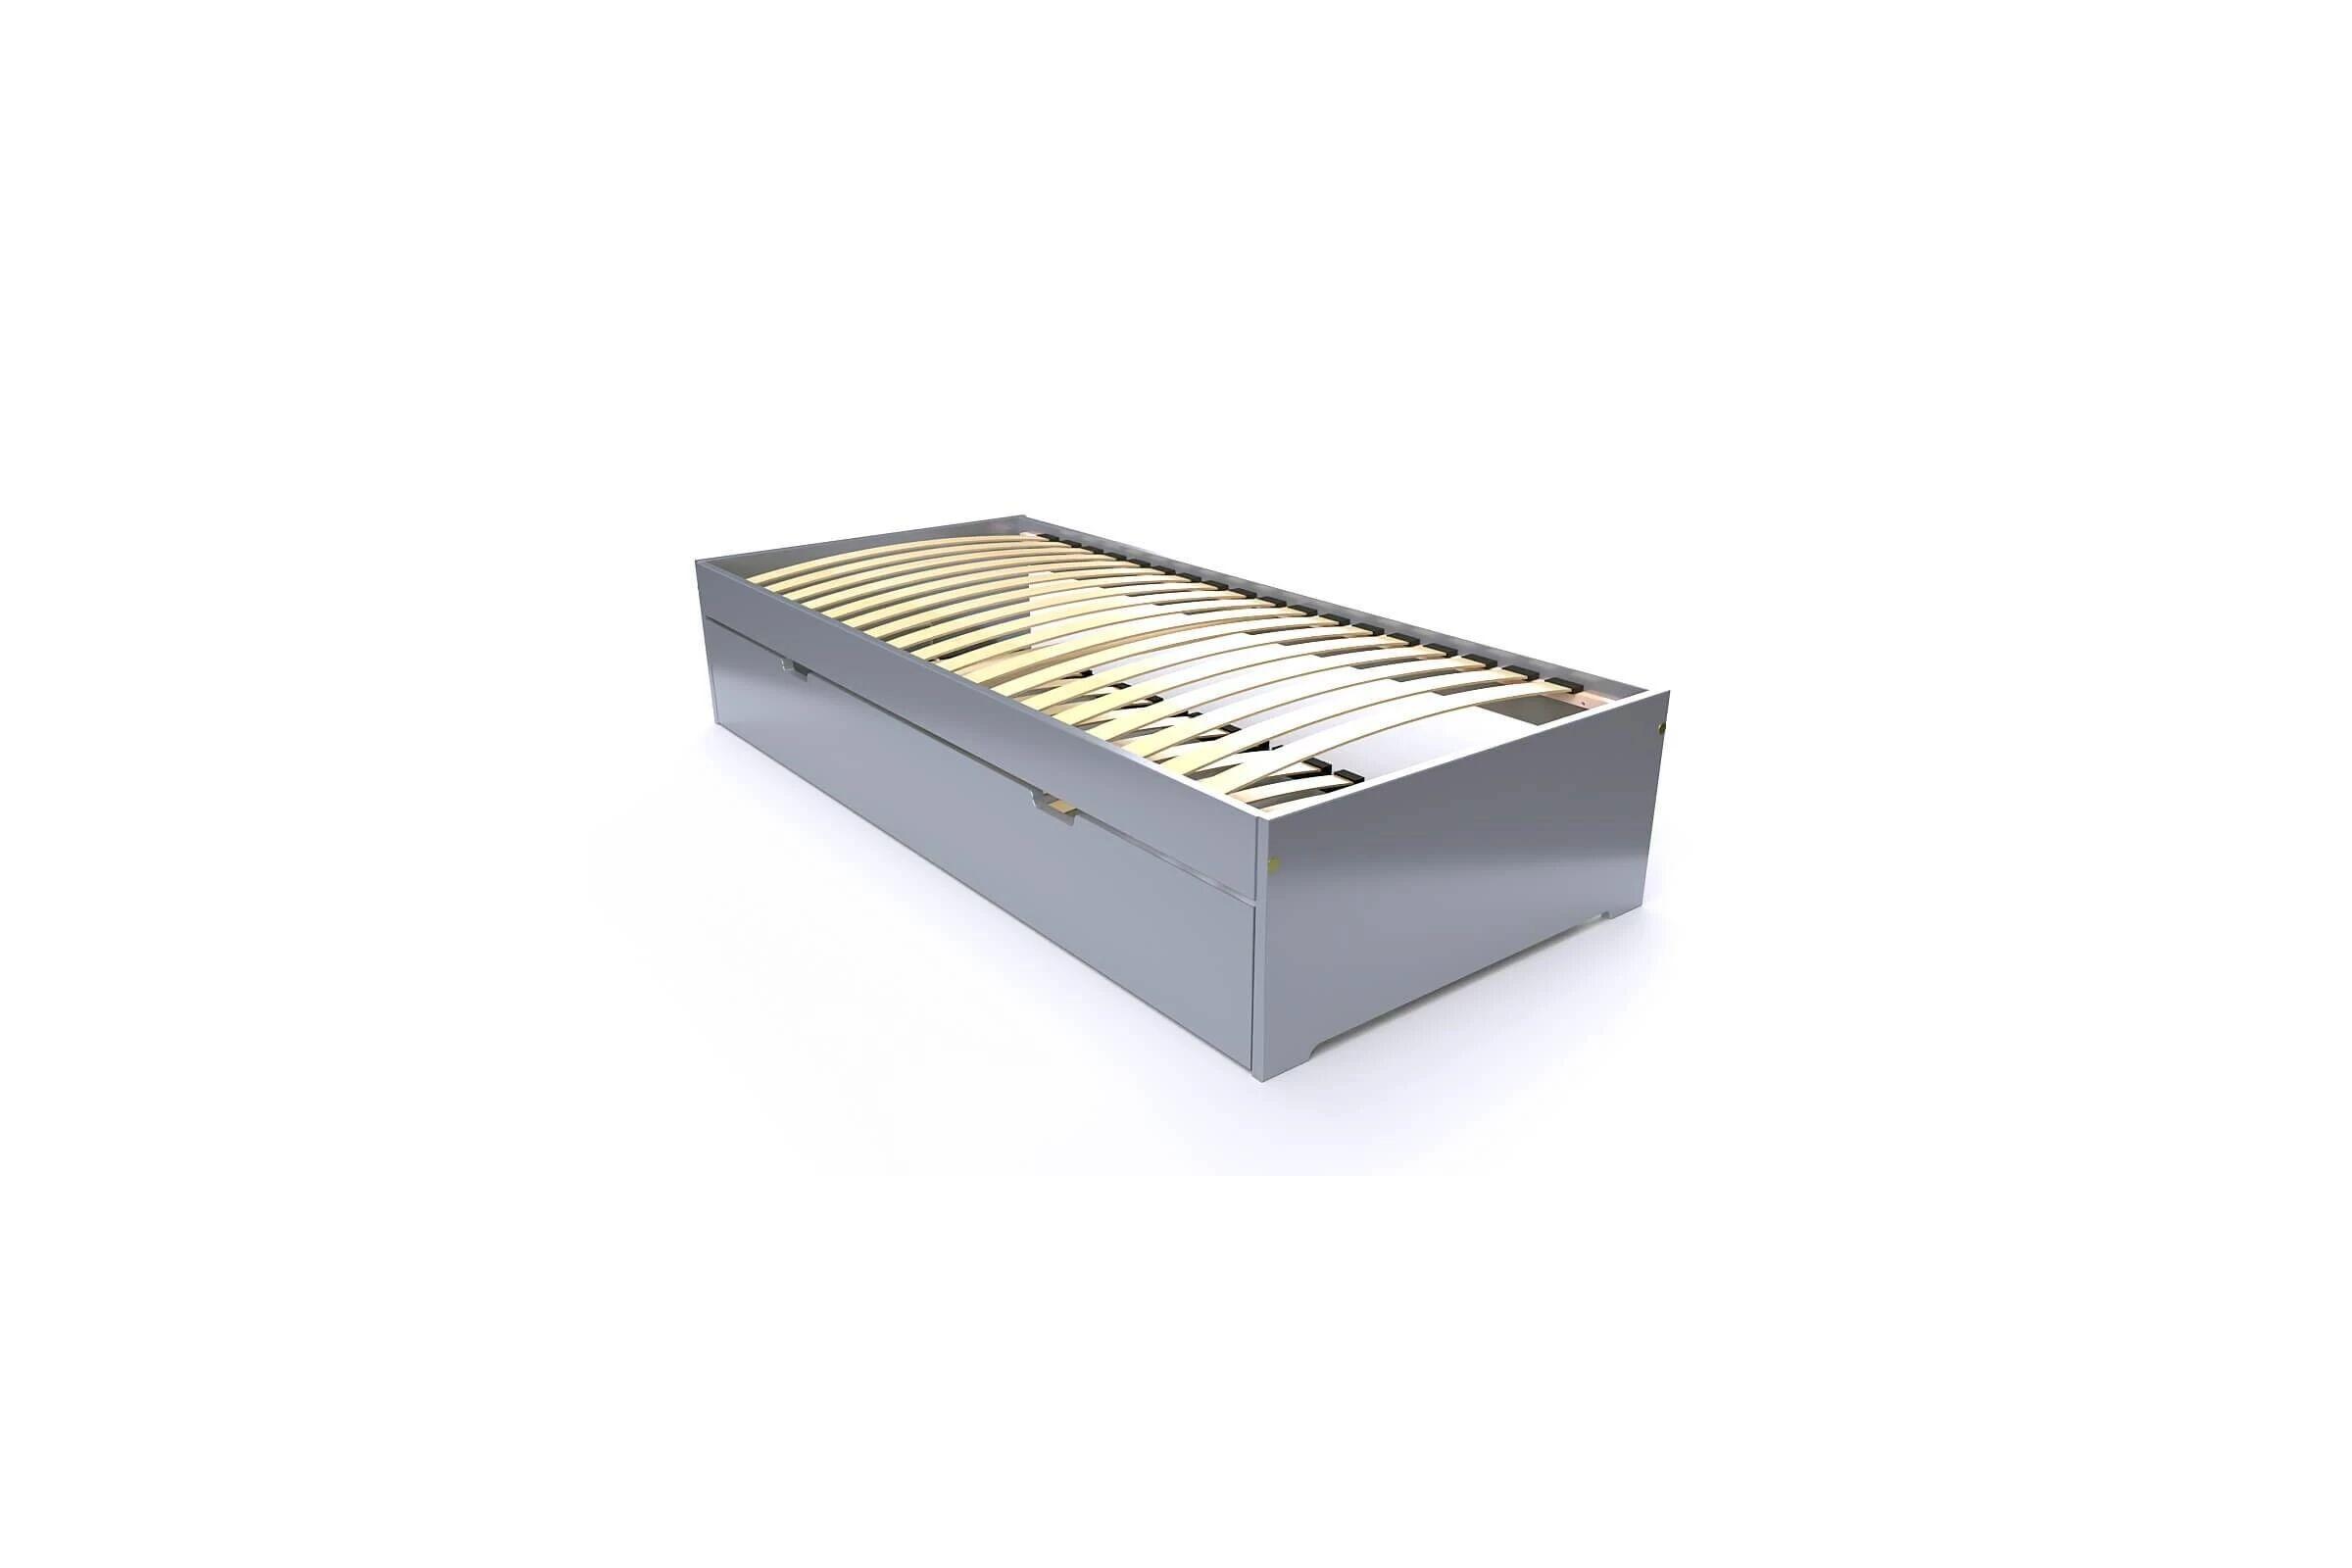 Abc meubles - lit gigogne malo avec tiroir lit bois gris aluminium 90x190